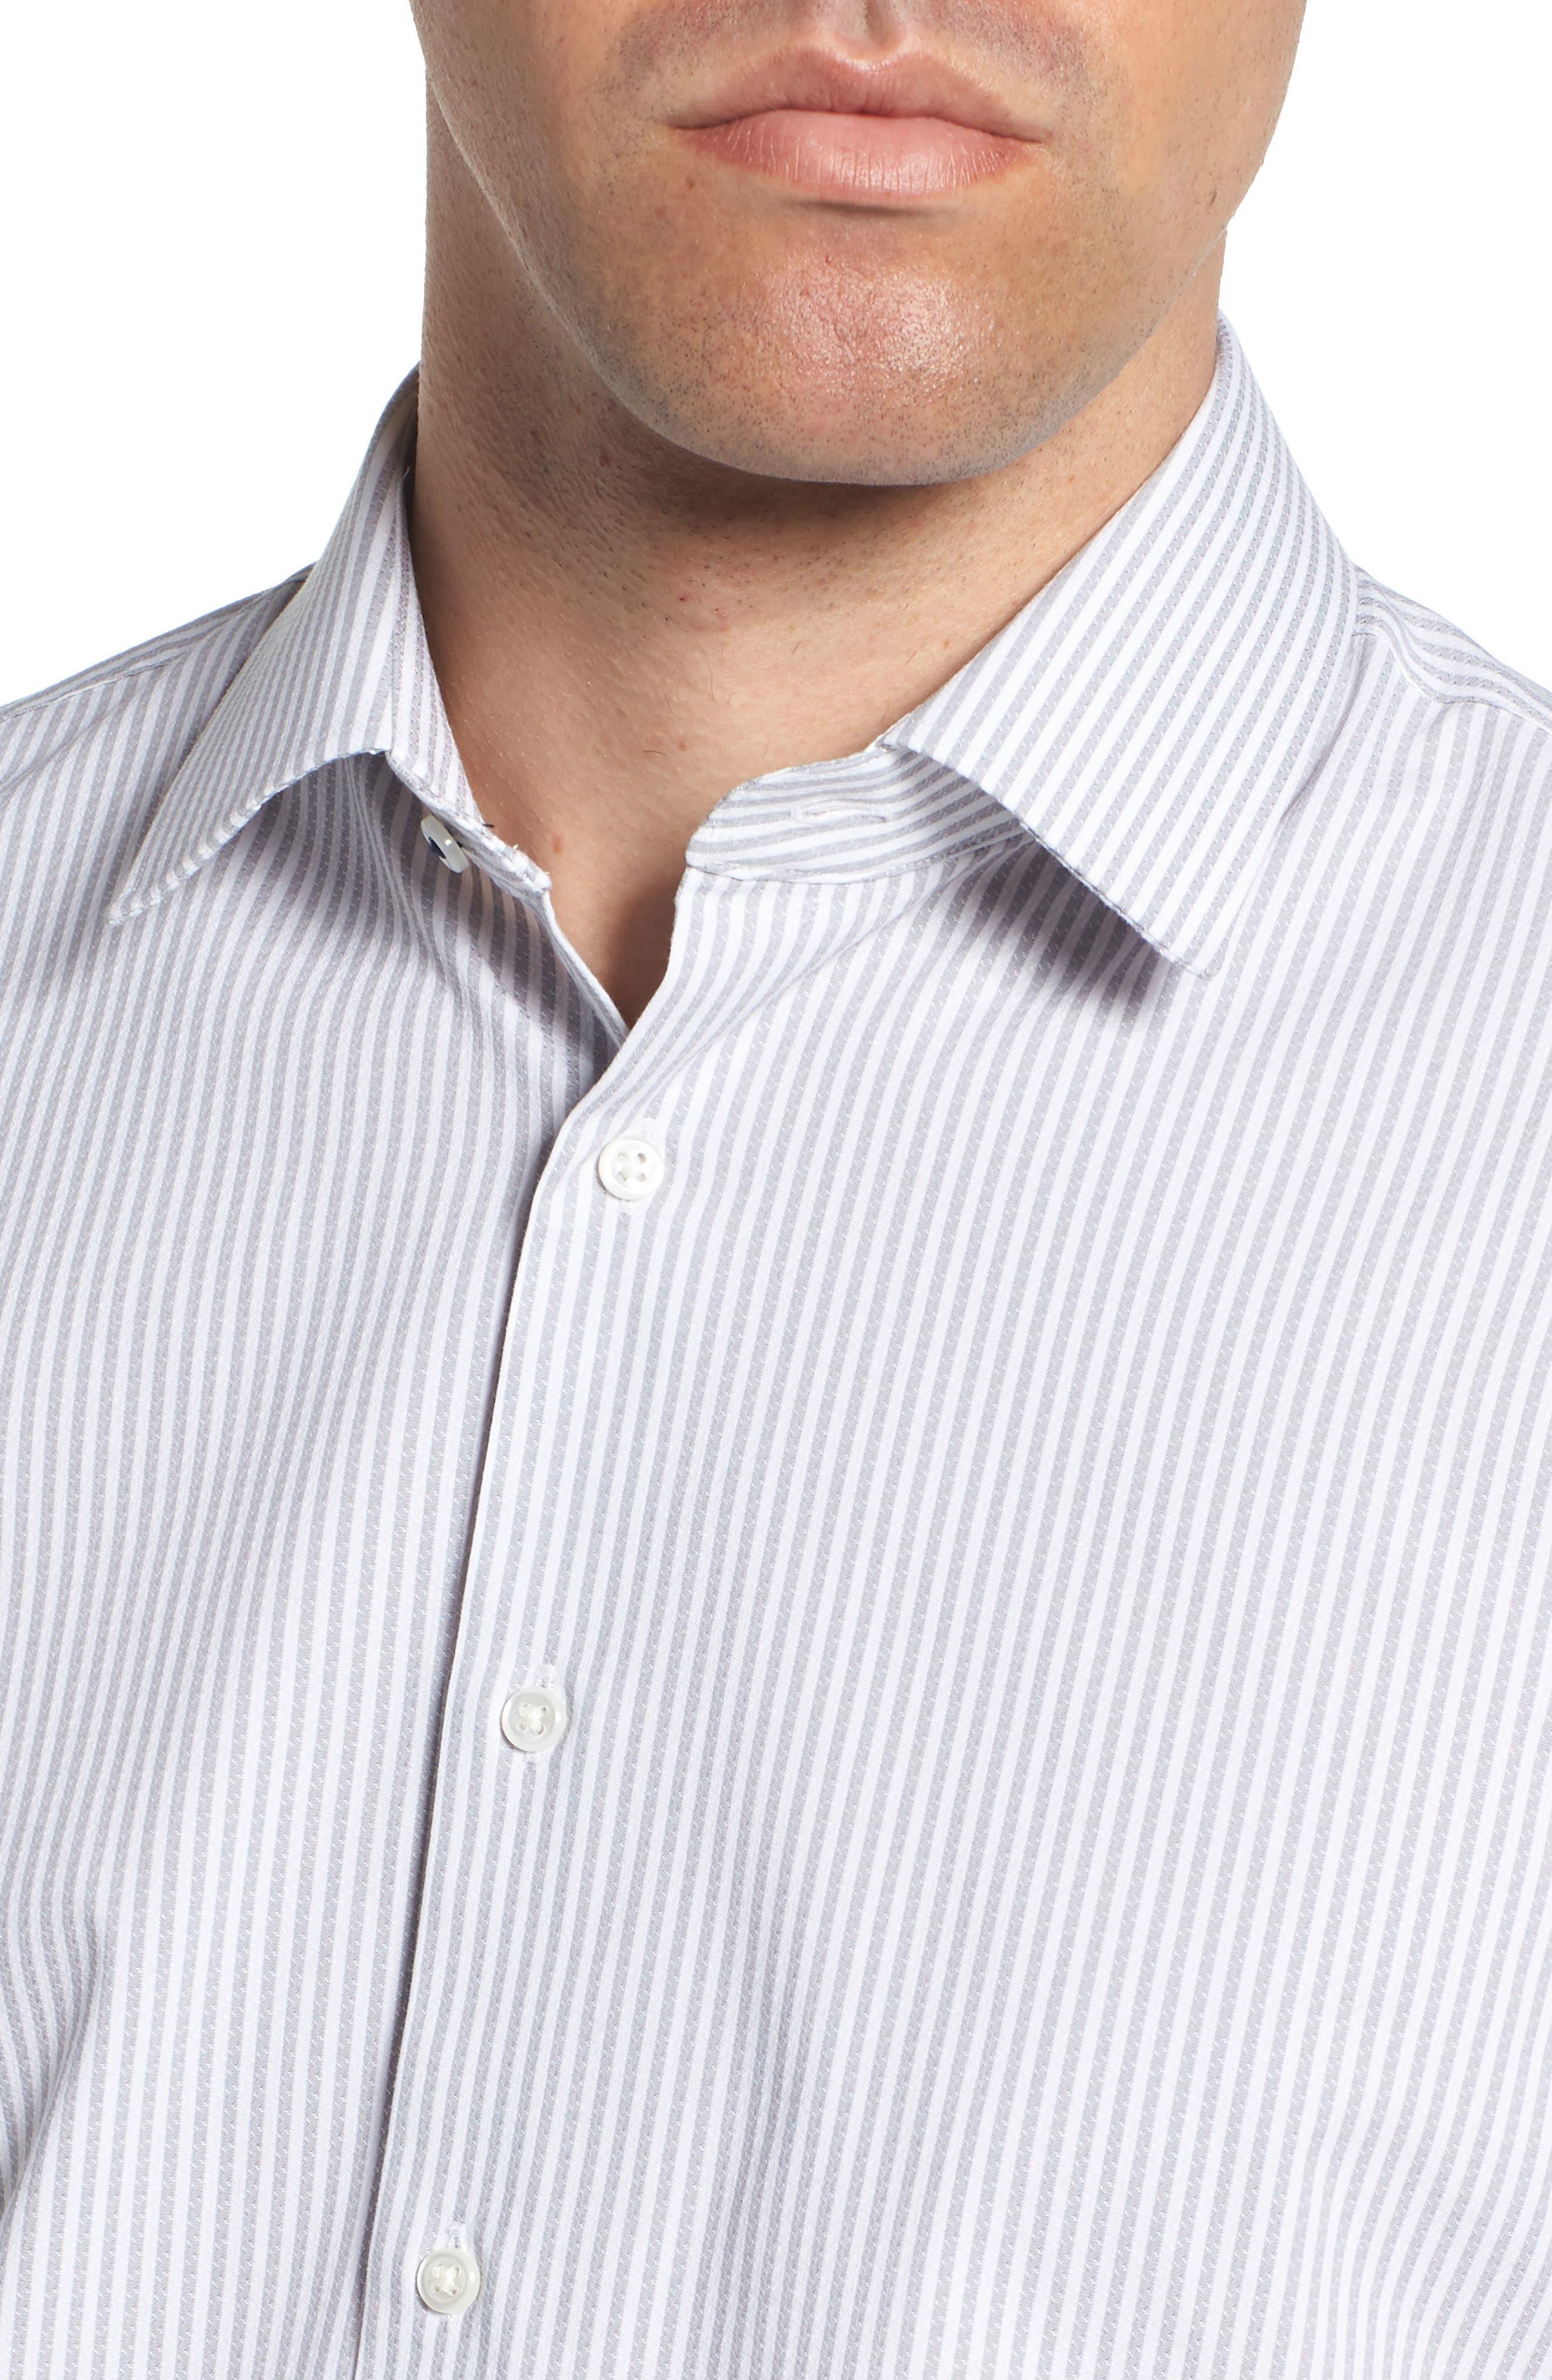 Tech-Smart Trim Fit Stripe Stretch Dress Shirt,                             Alternate thumbnail 2, color,                             050